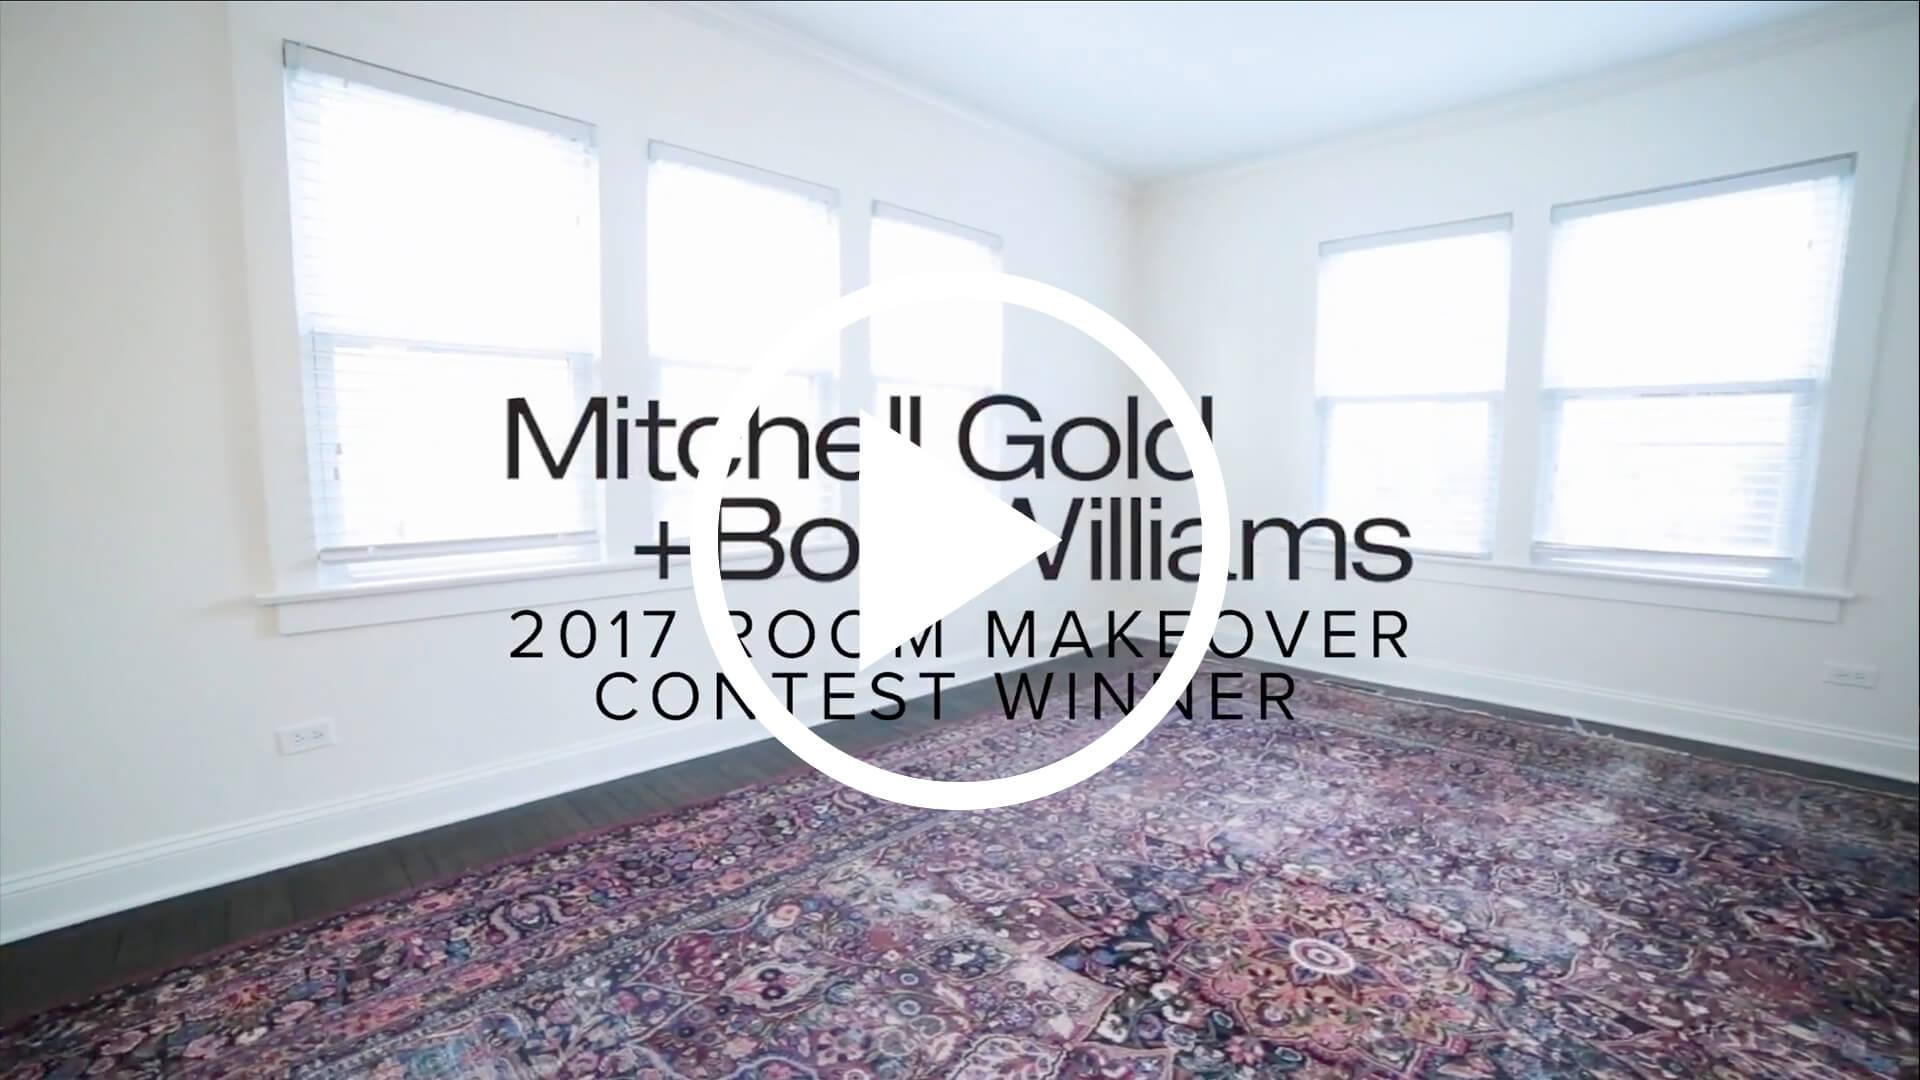 2017 $10,000 Room Makeover Winner: The Big Reveal